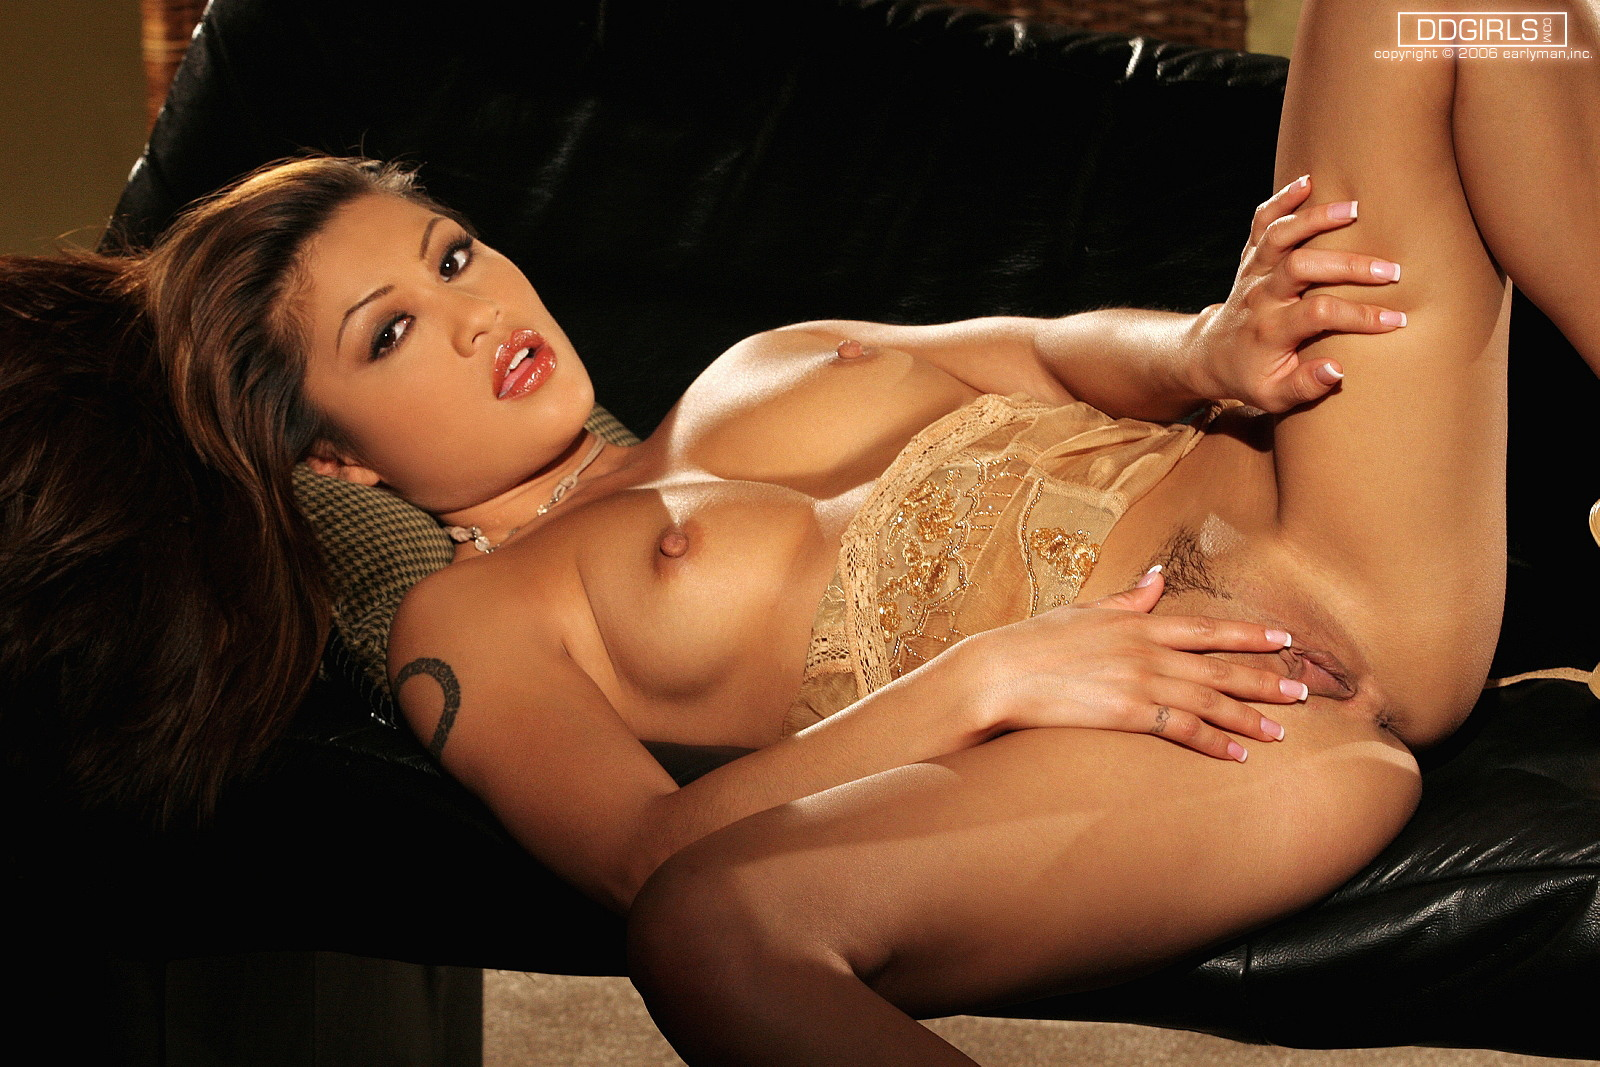 Ebony porn starring pleasure